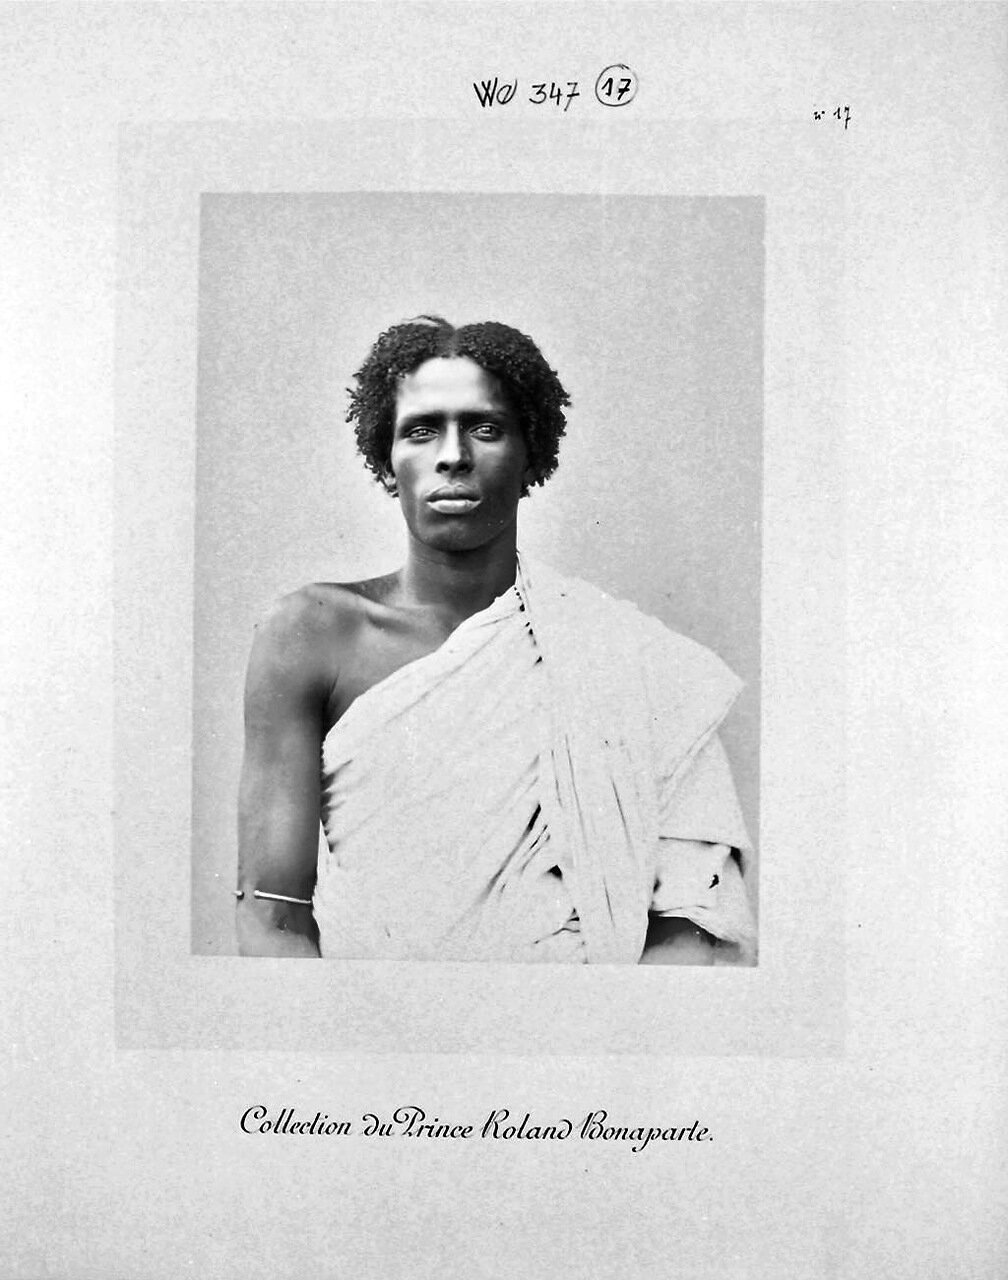 Егал Мохамед, кузнец племени Тумаль, 20 лет.